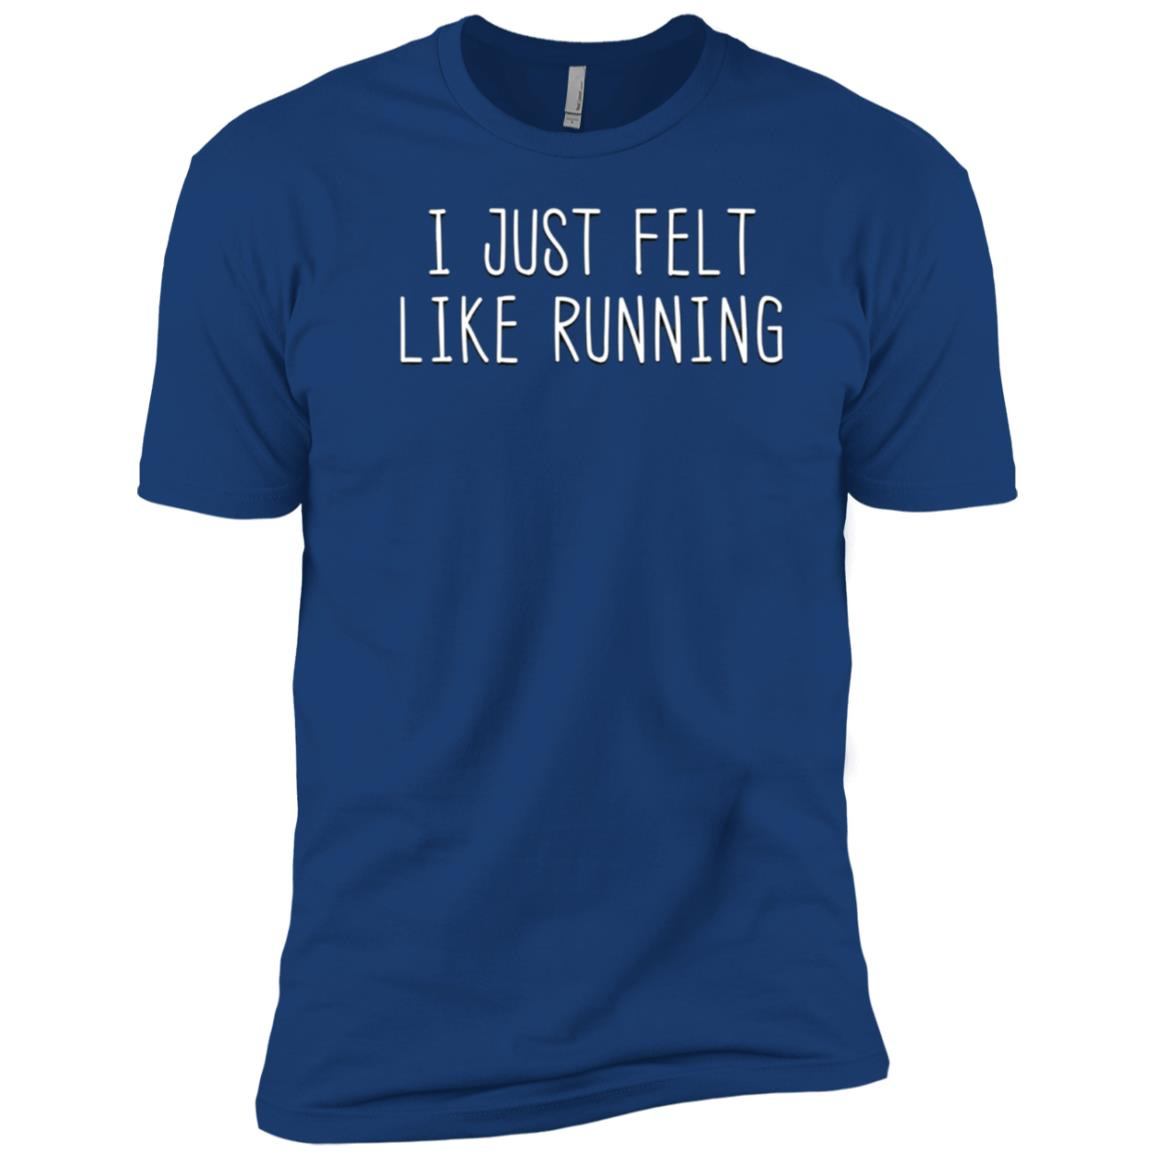 I Just Felt Like Running Workout Exercise Jogging Men Short Sleeve T-Shirt